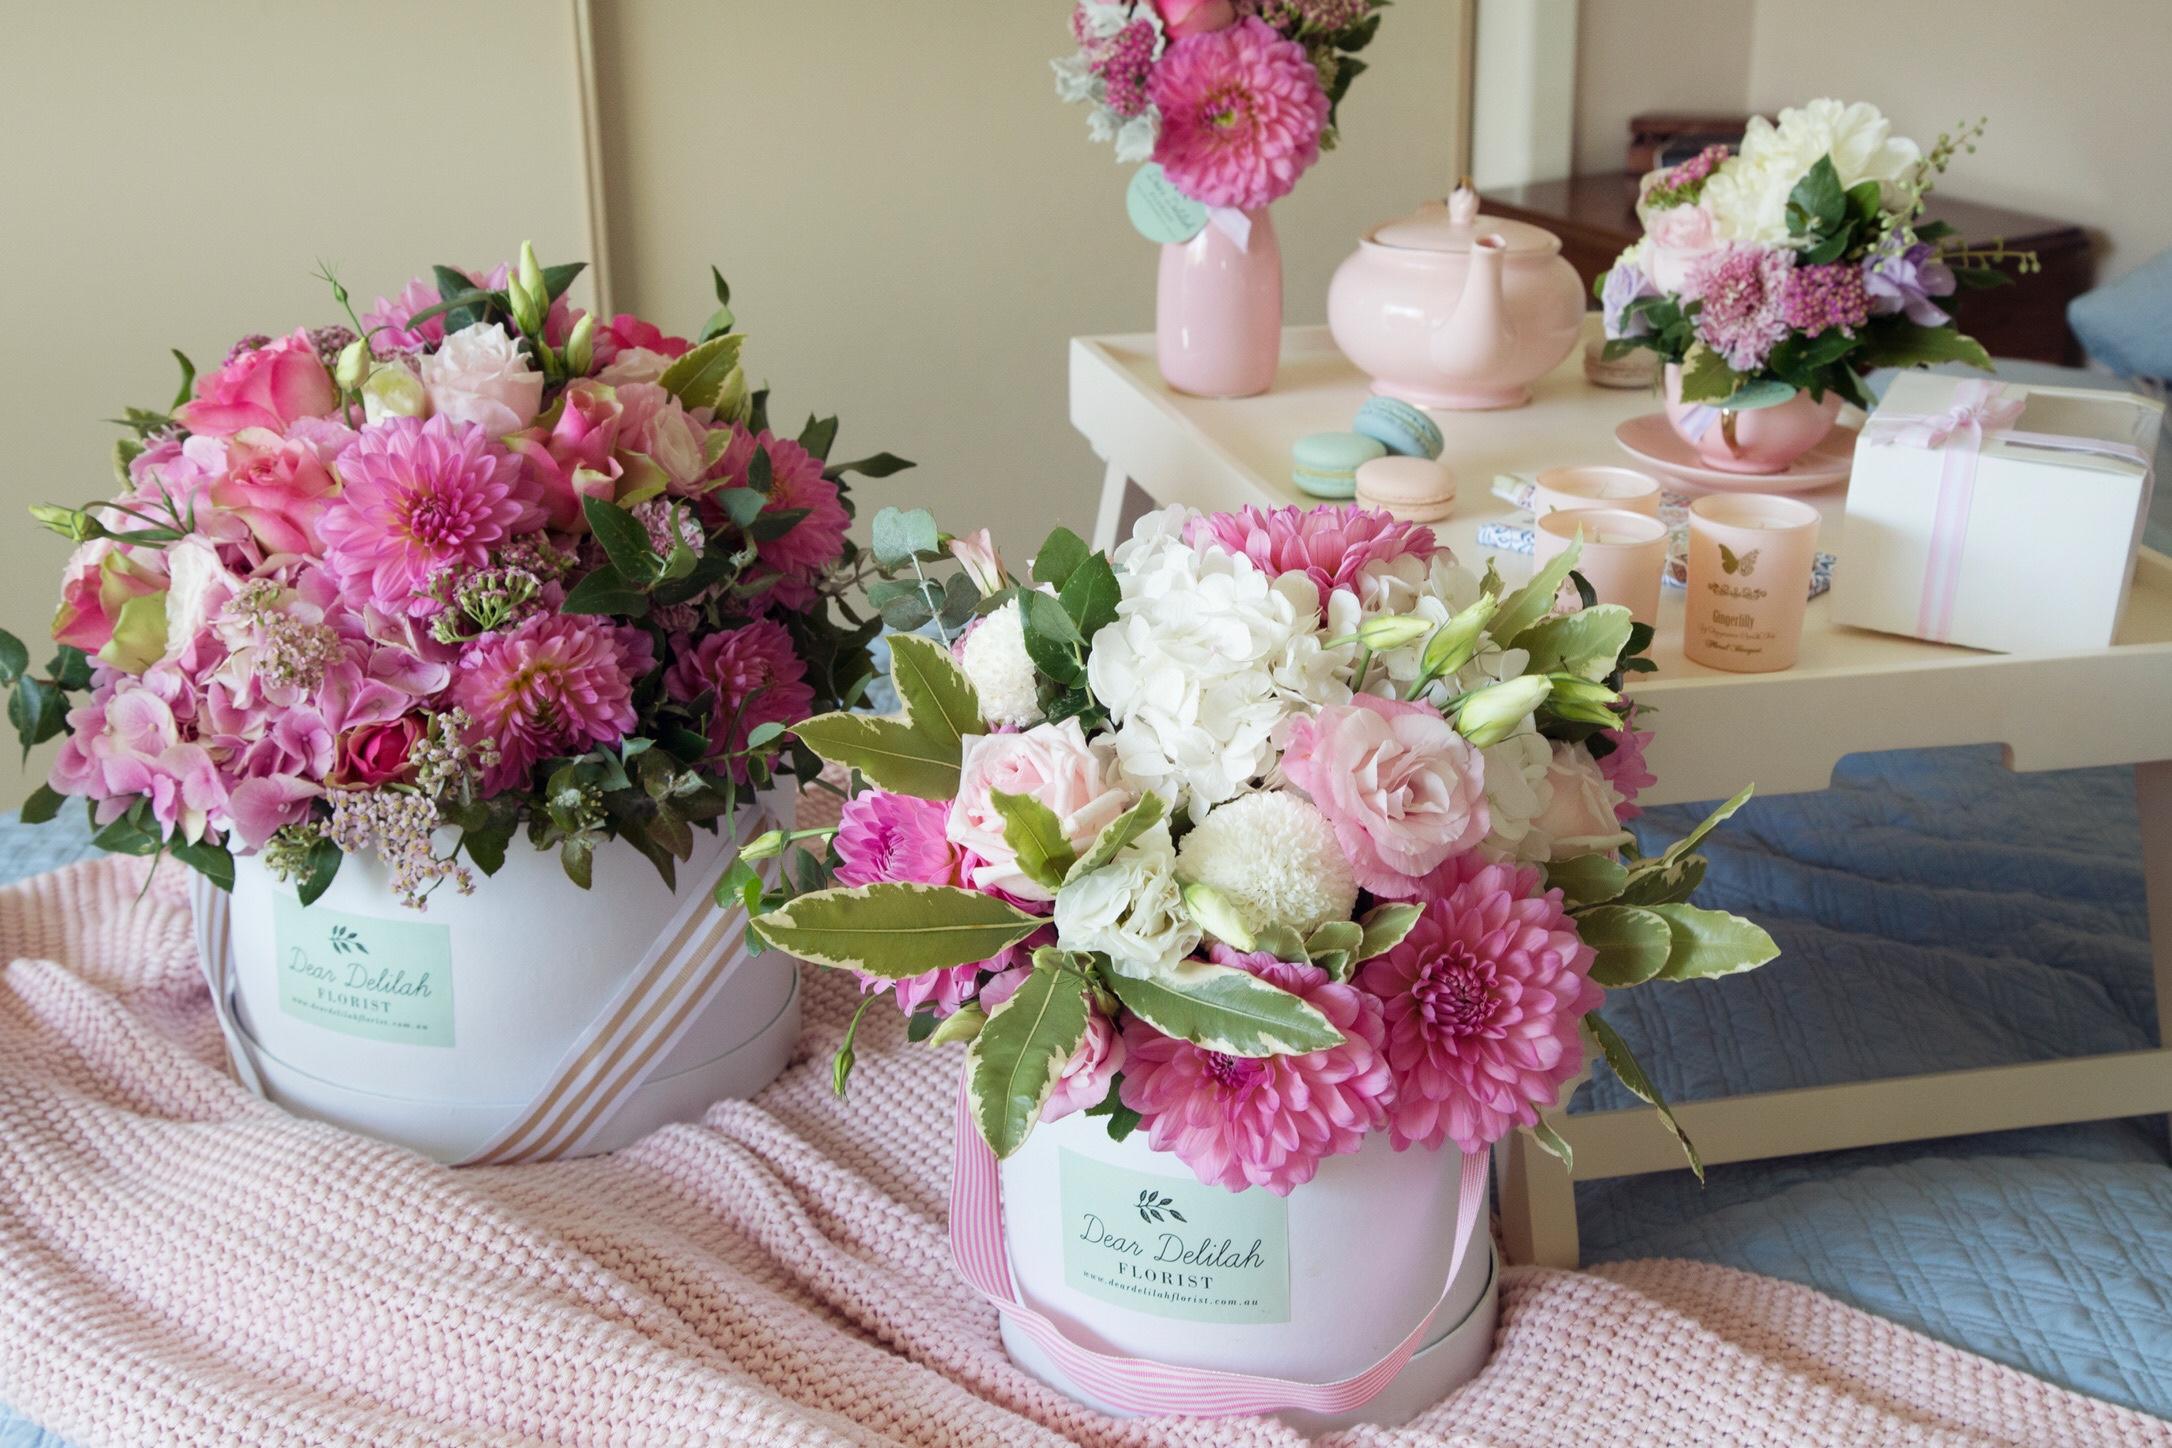 Pretty Paisley | Dear Delilah Florist, Latrobe Valley